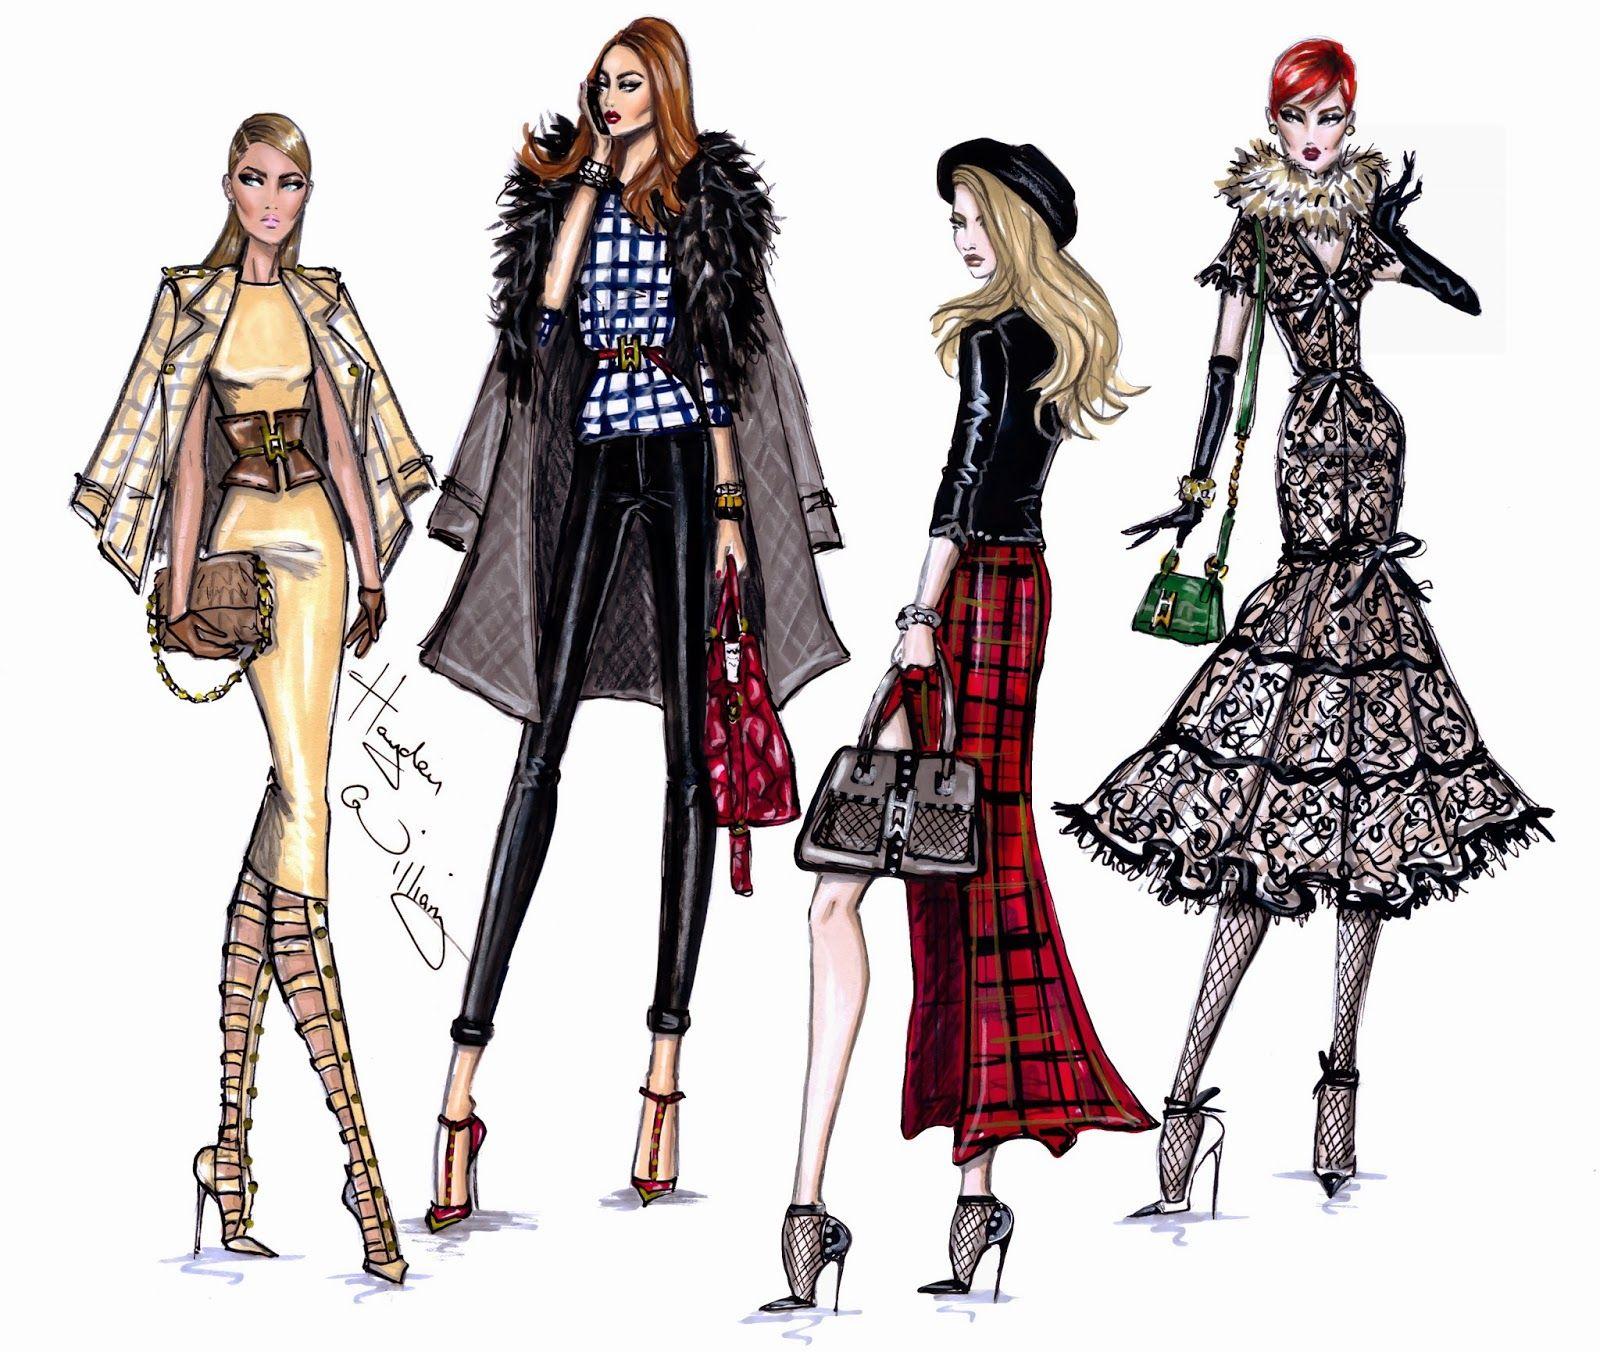 Fashion sketches new fashion sketches - Hayden Williams Fashion Illustrations Fashion Week Style By Hayden Williams